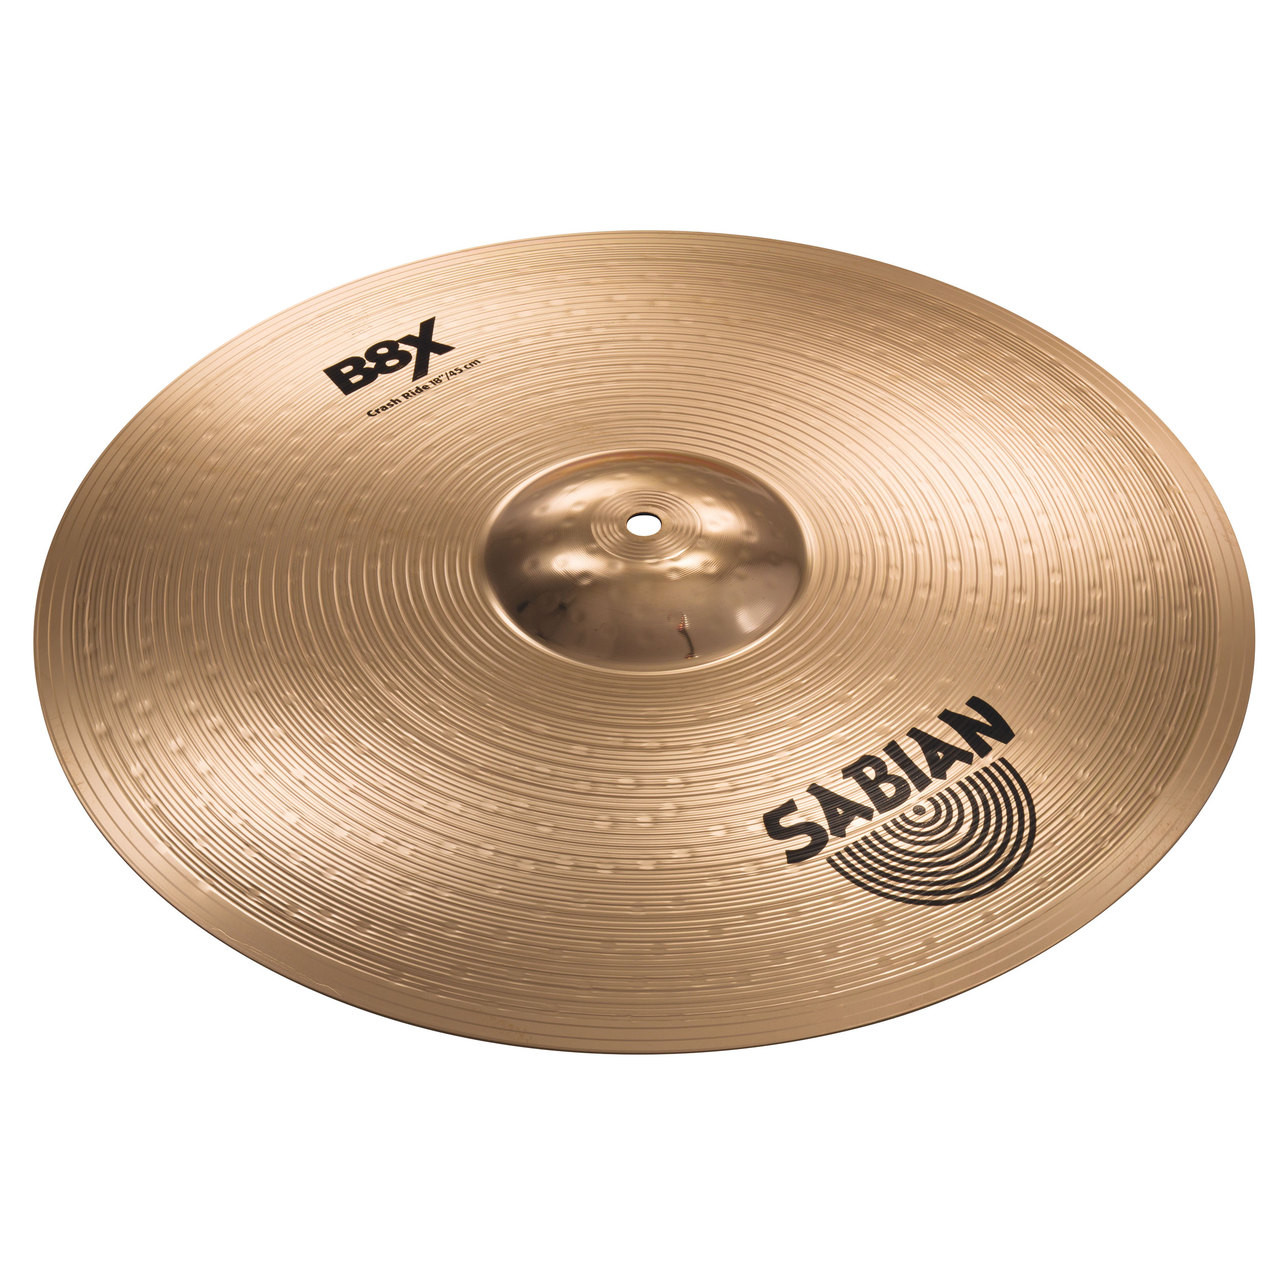 sabian b8x 18 crash ride cymbal. Black Bedroom Furniture Sets. Home Design Ideas